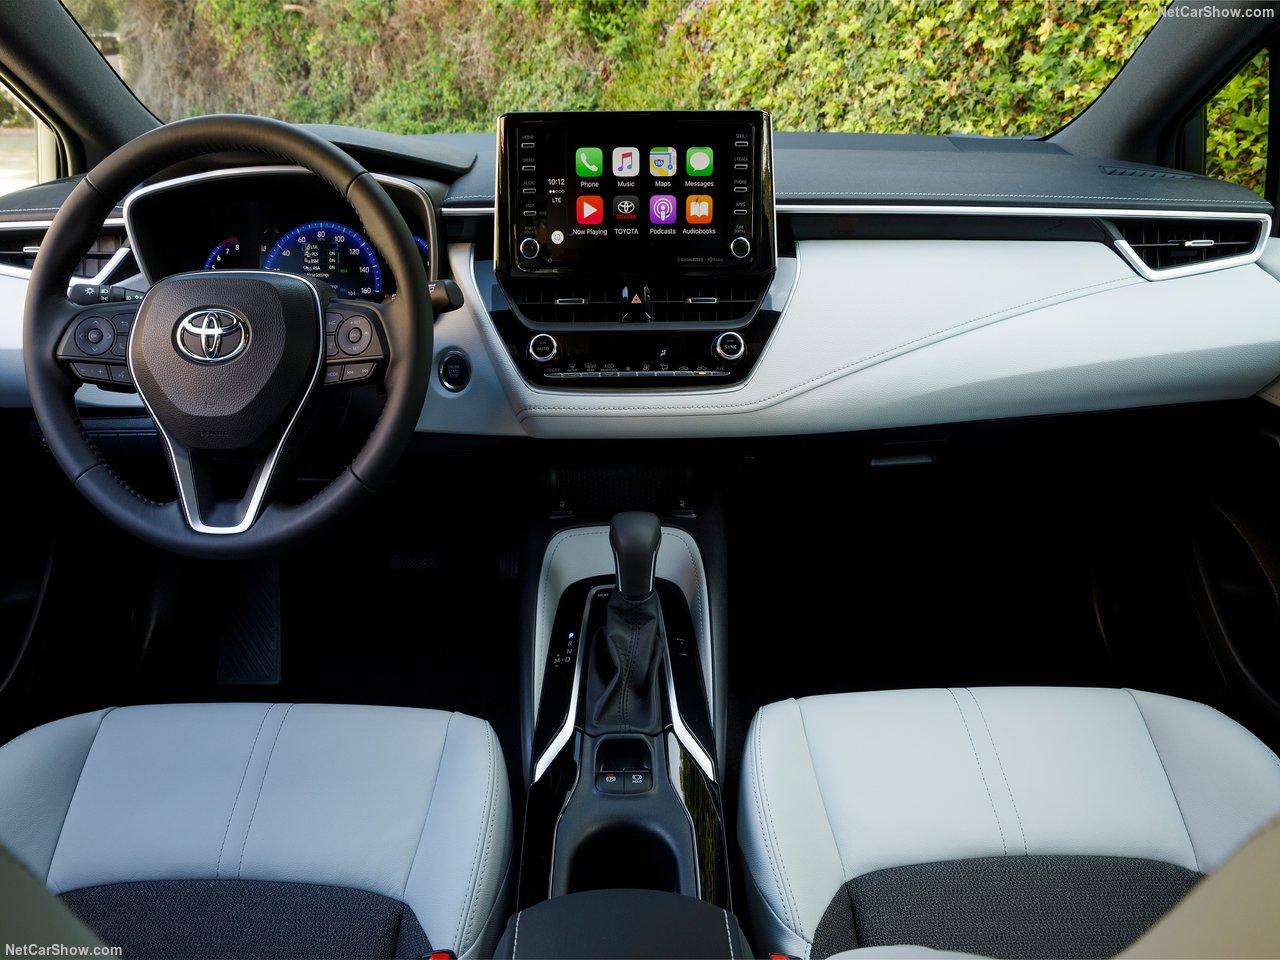 Toyota-Corolla_Hatchback-2019-1280-28.jpg